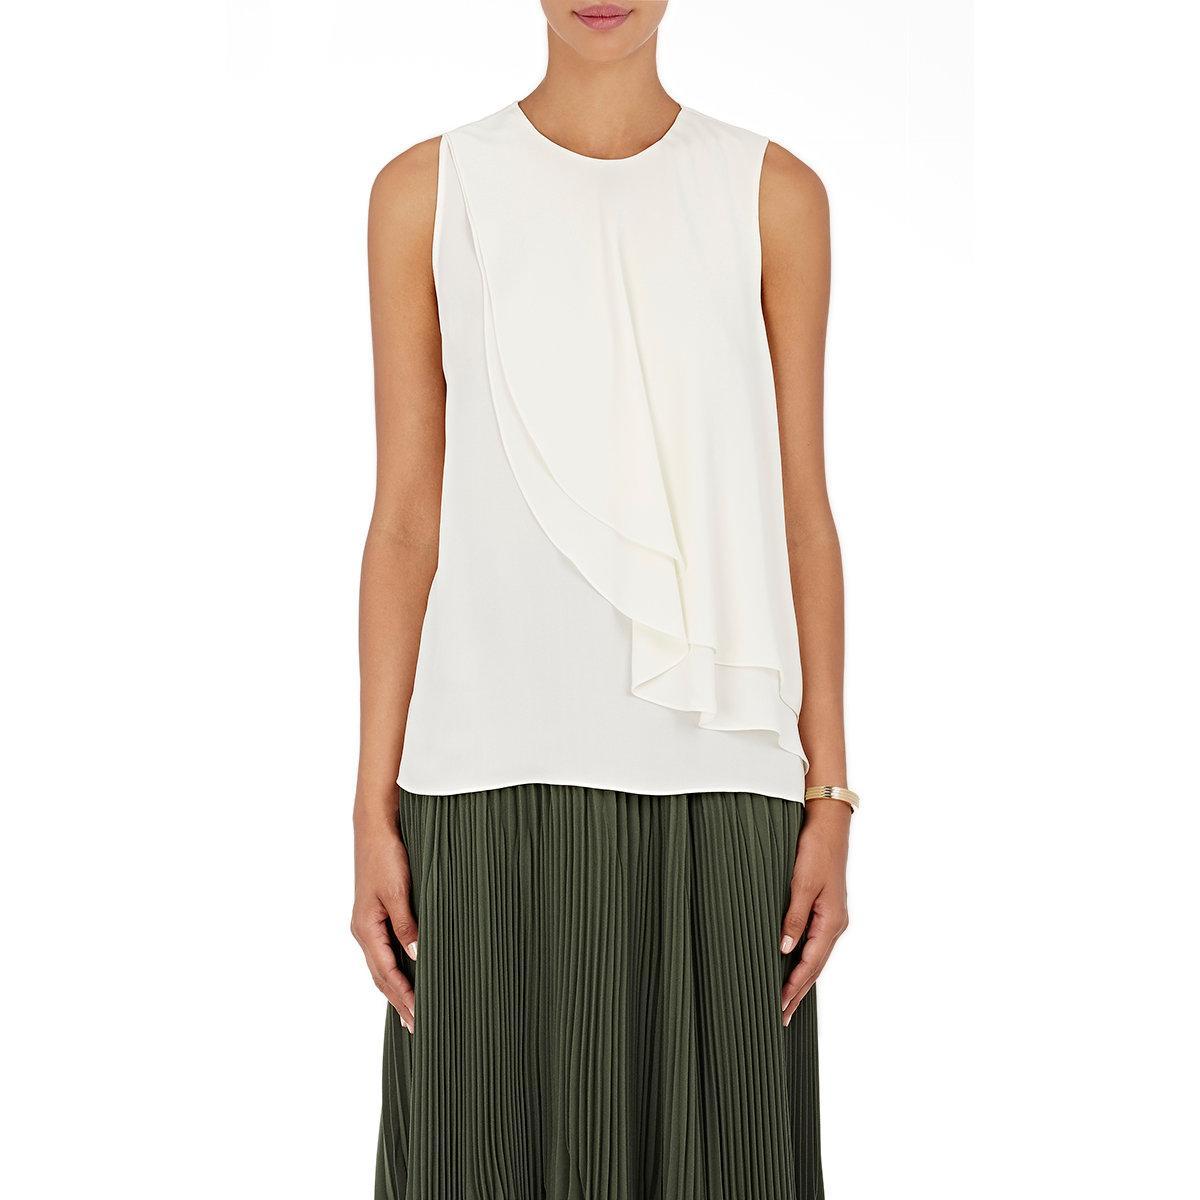 0082353e65d7d Lyst - Theory Elmali Silk Georgette Top in White